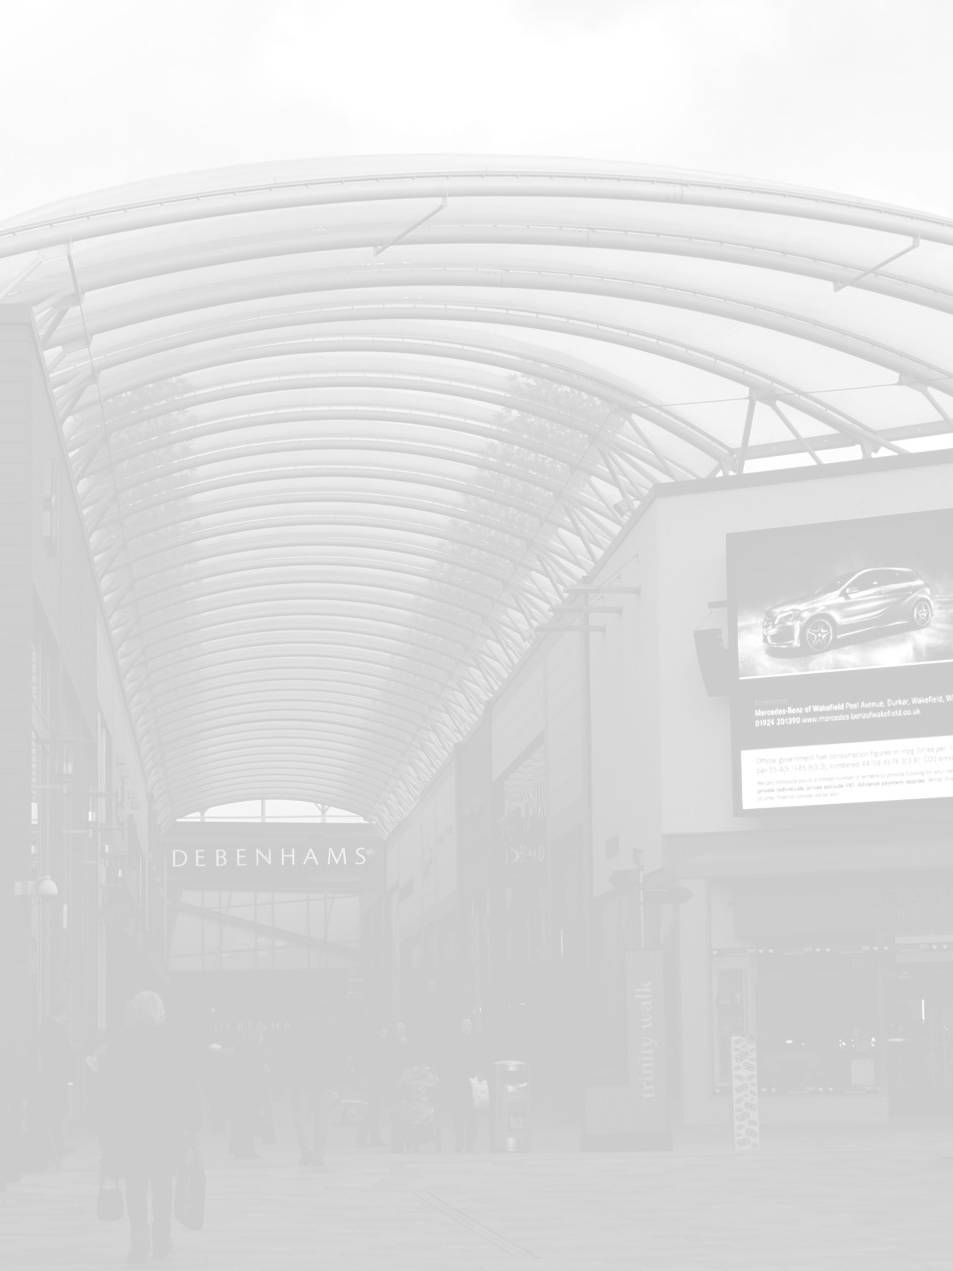 seo wakefield image of trinity shopping wakefield